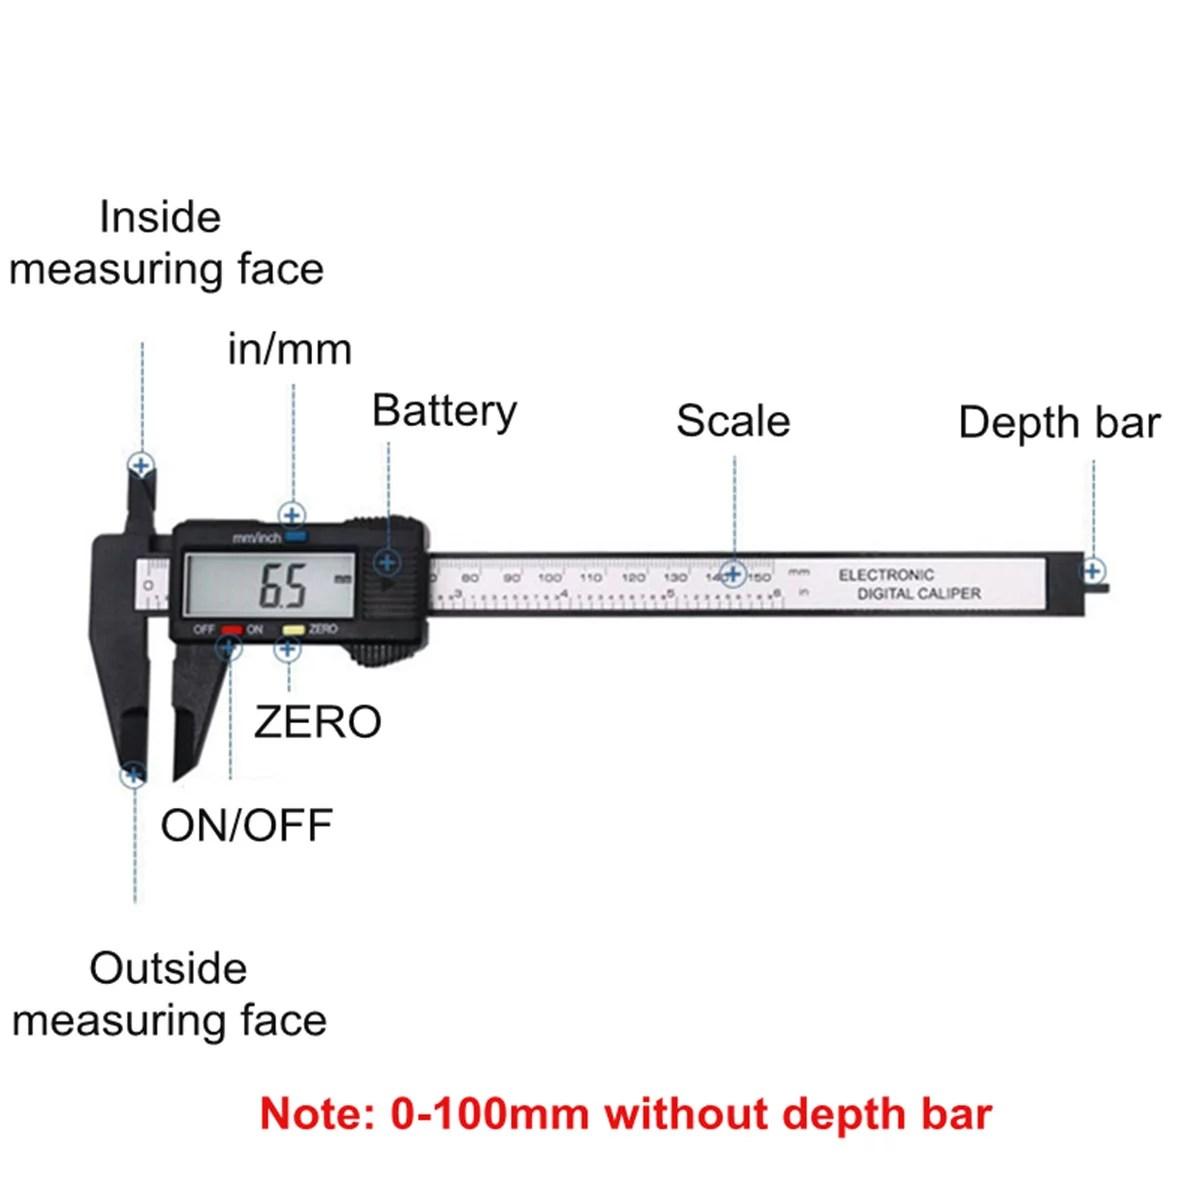 hight resolution of moaere electronic digital vernier caliper advanced onsite sensor absolute scale digital caliper 0 0005 0 01mm resolution lcd walmart com